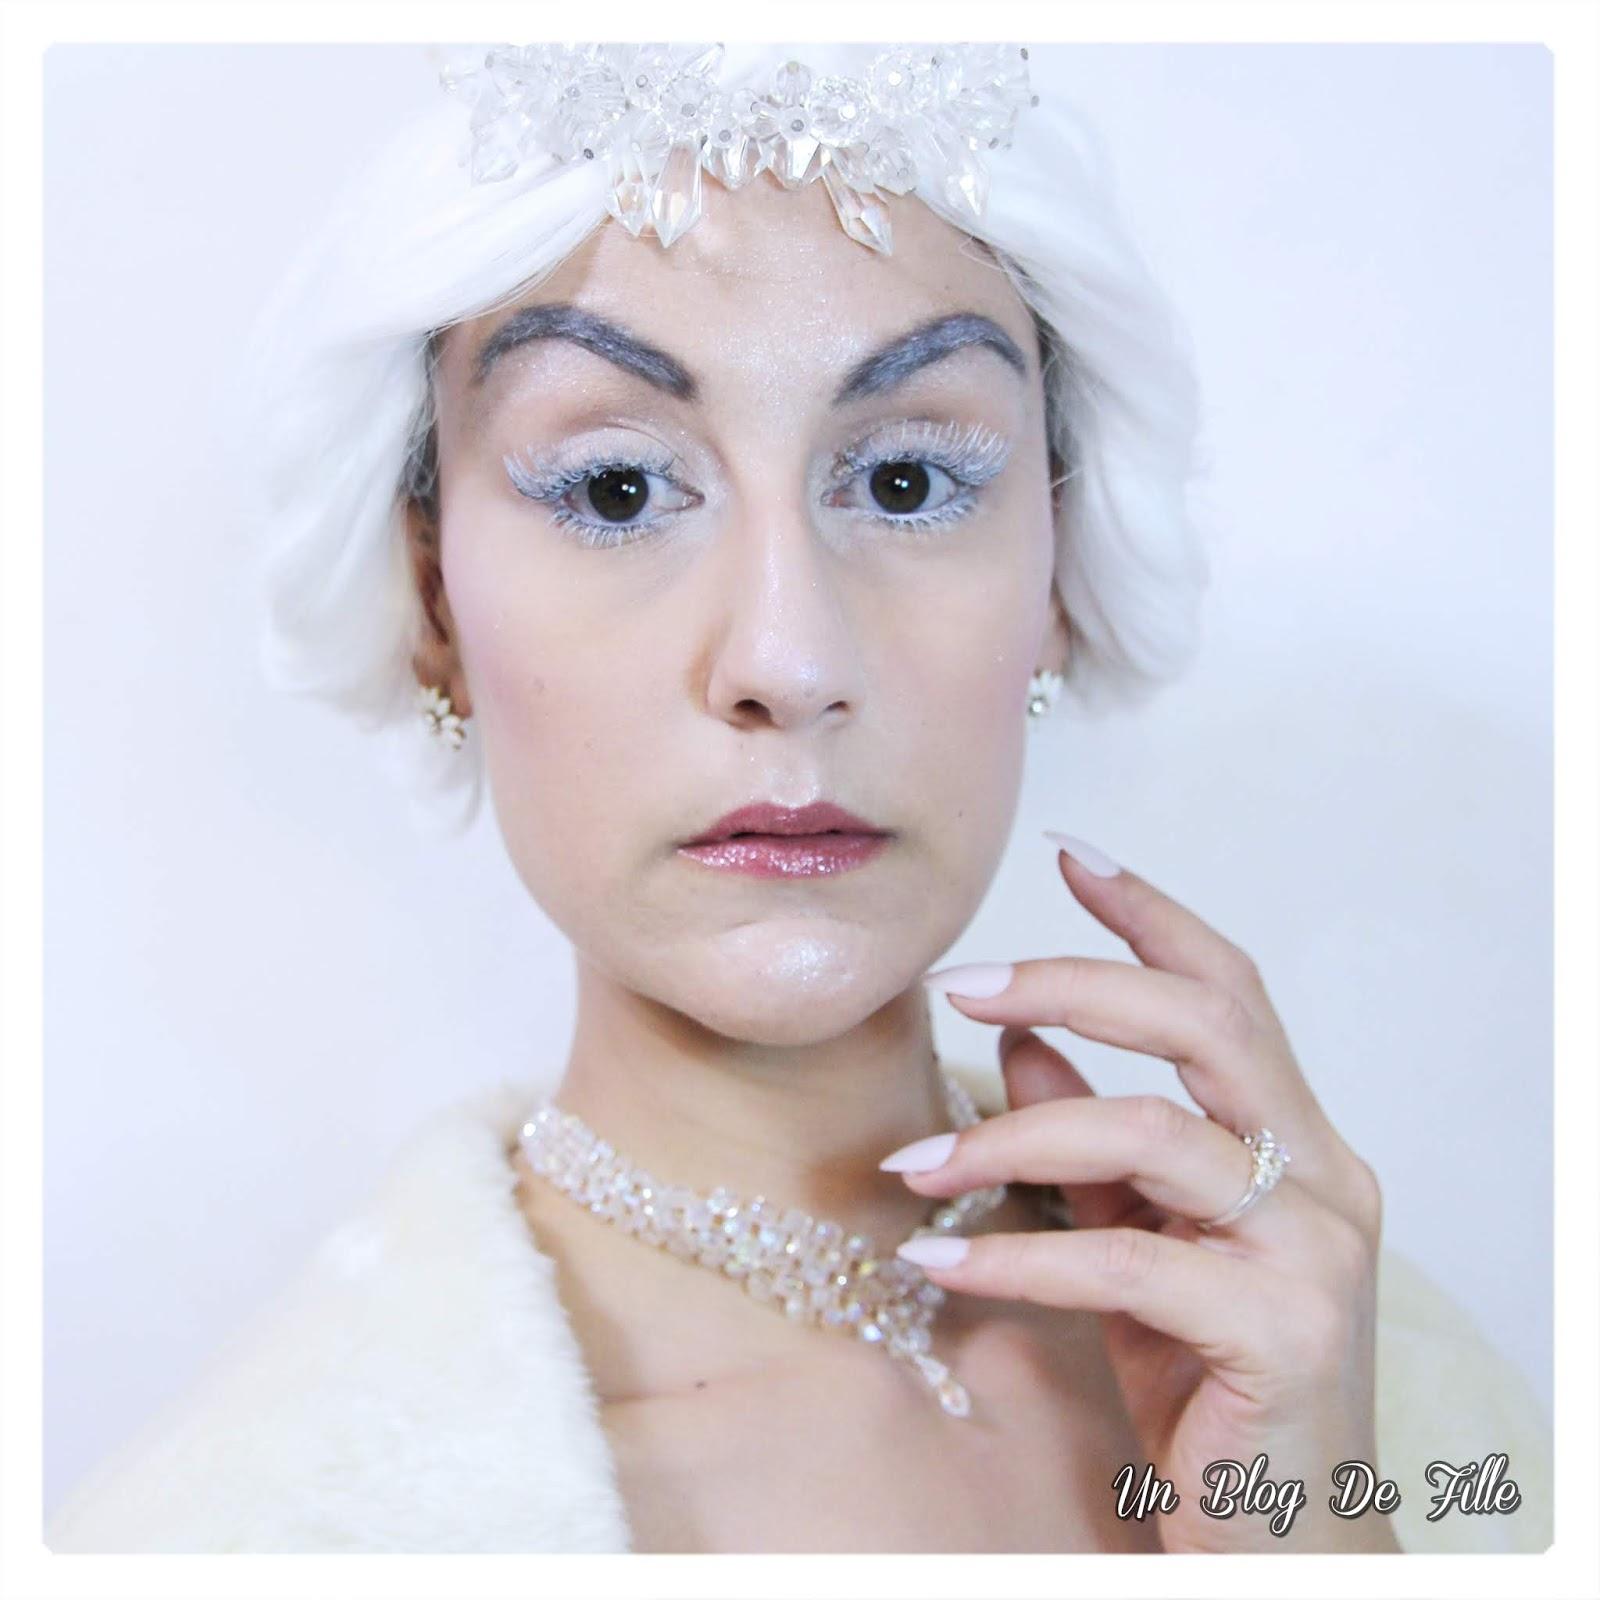 http://www.unblogdefille.fr/2019/12/maquillage-artistique-reine-des-glaces.html